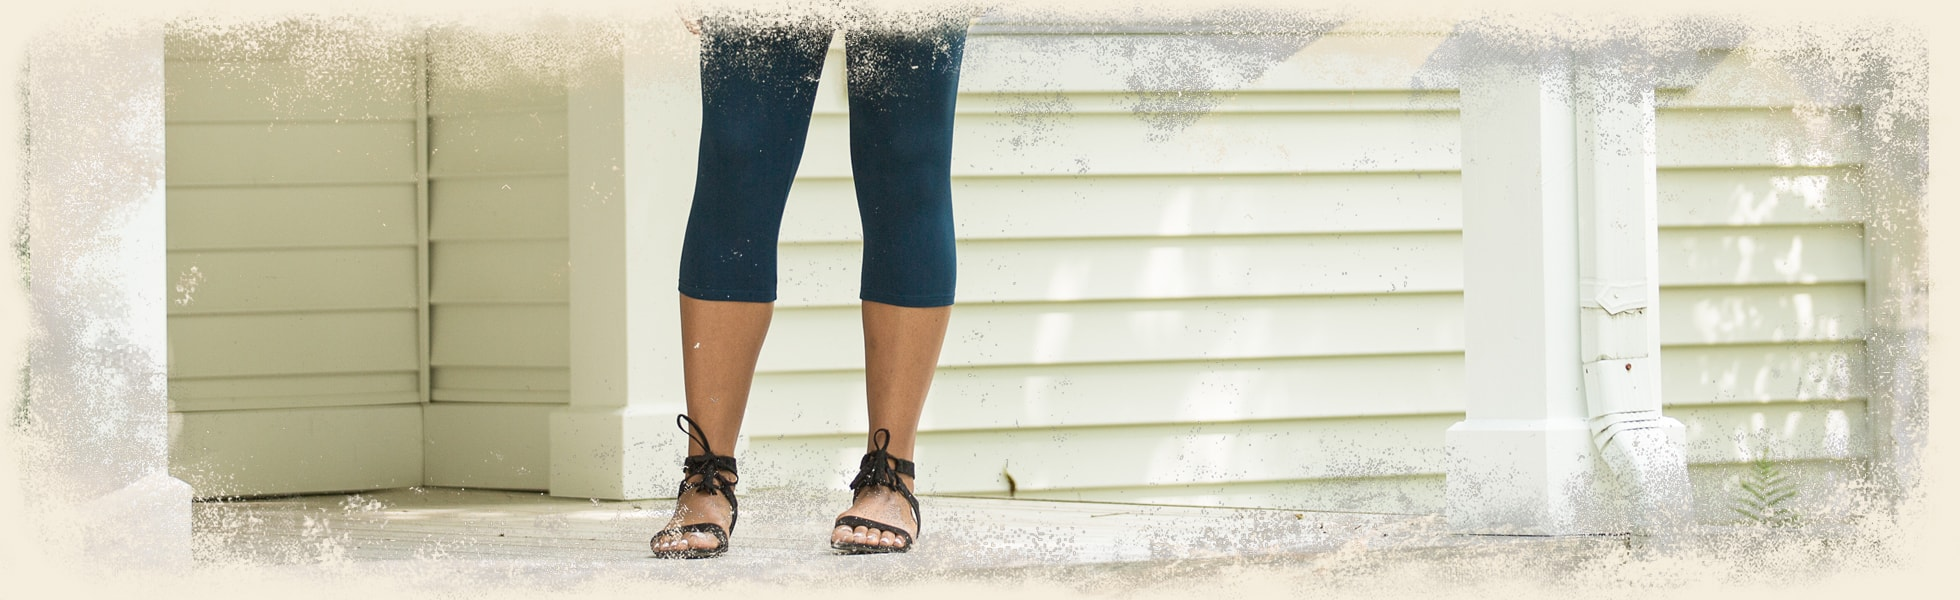 product-apparel-page-bannerleggings032918-min.jpg